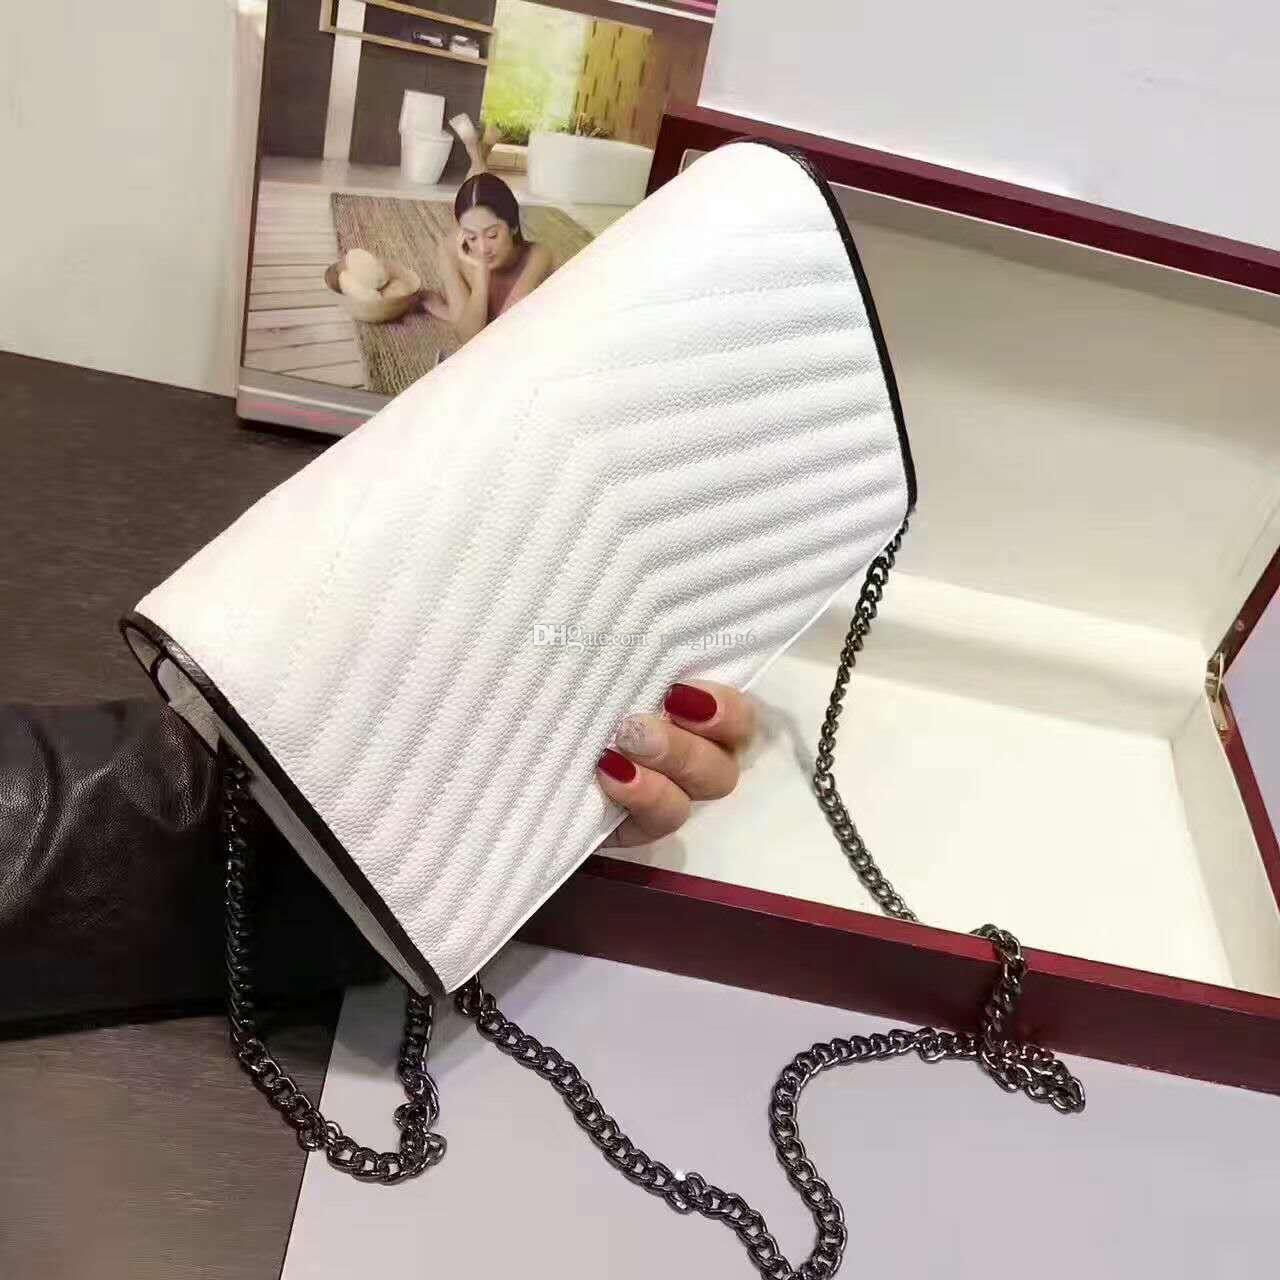 freeship famous brand top quality small bag women handbag messenger bag Caviar leather genuine leather bag chain stripe with box